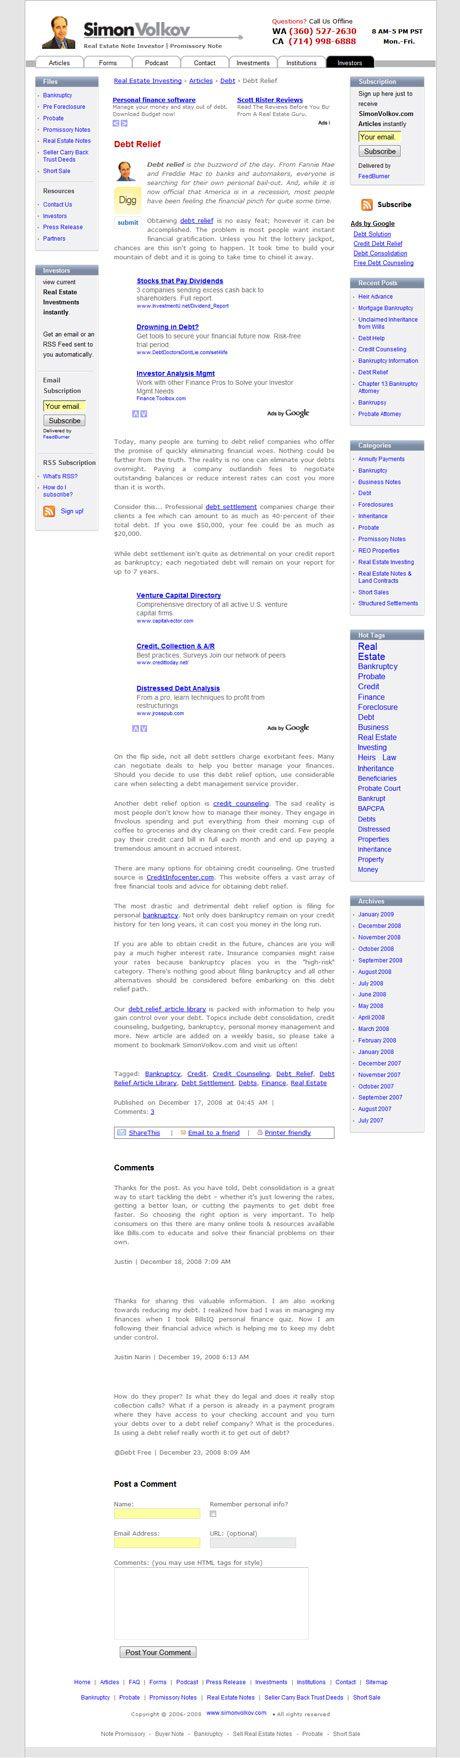 Simon Volkov.com Individual Article (Blog Section)